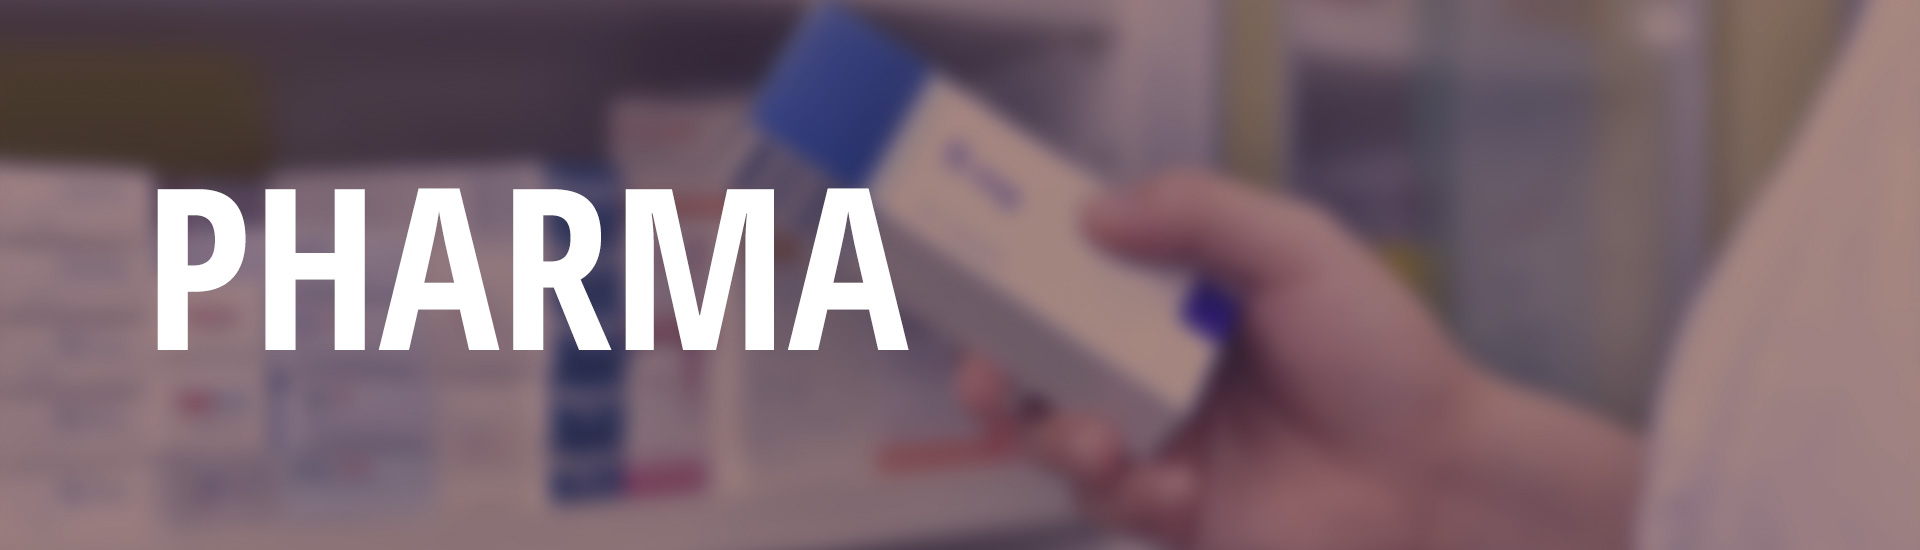 Mega-Packs für die Pharma-Logistik